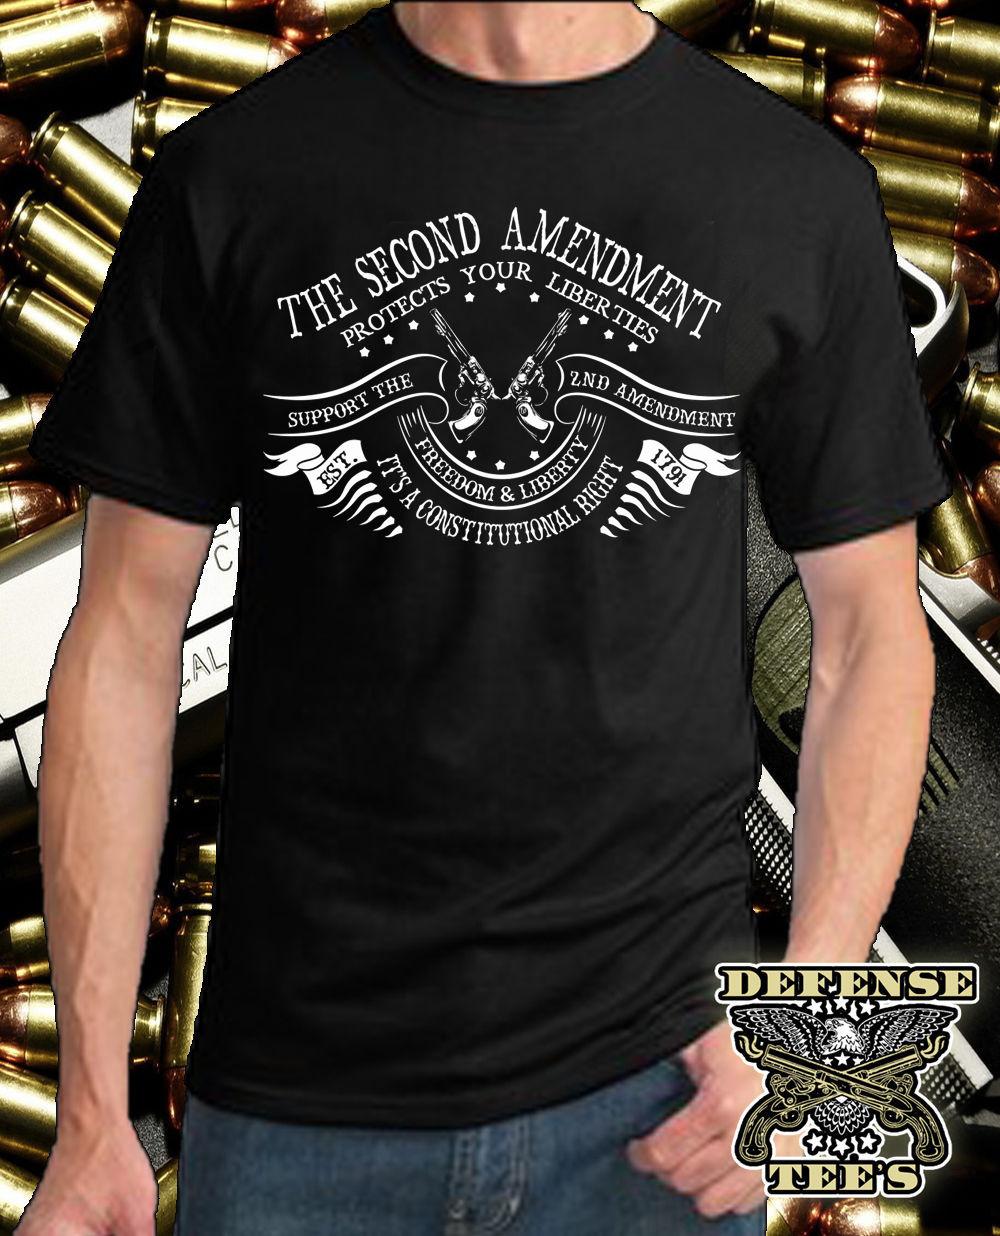 Donald Trump 2020 tshirt America Flag 2nd Amendment Gun Rights Men T-Shirt S-3XL